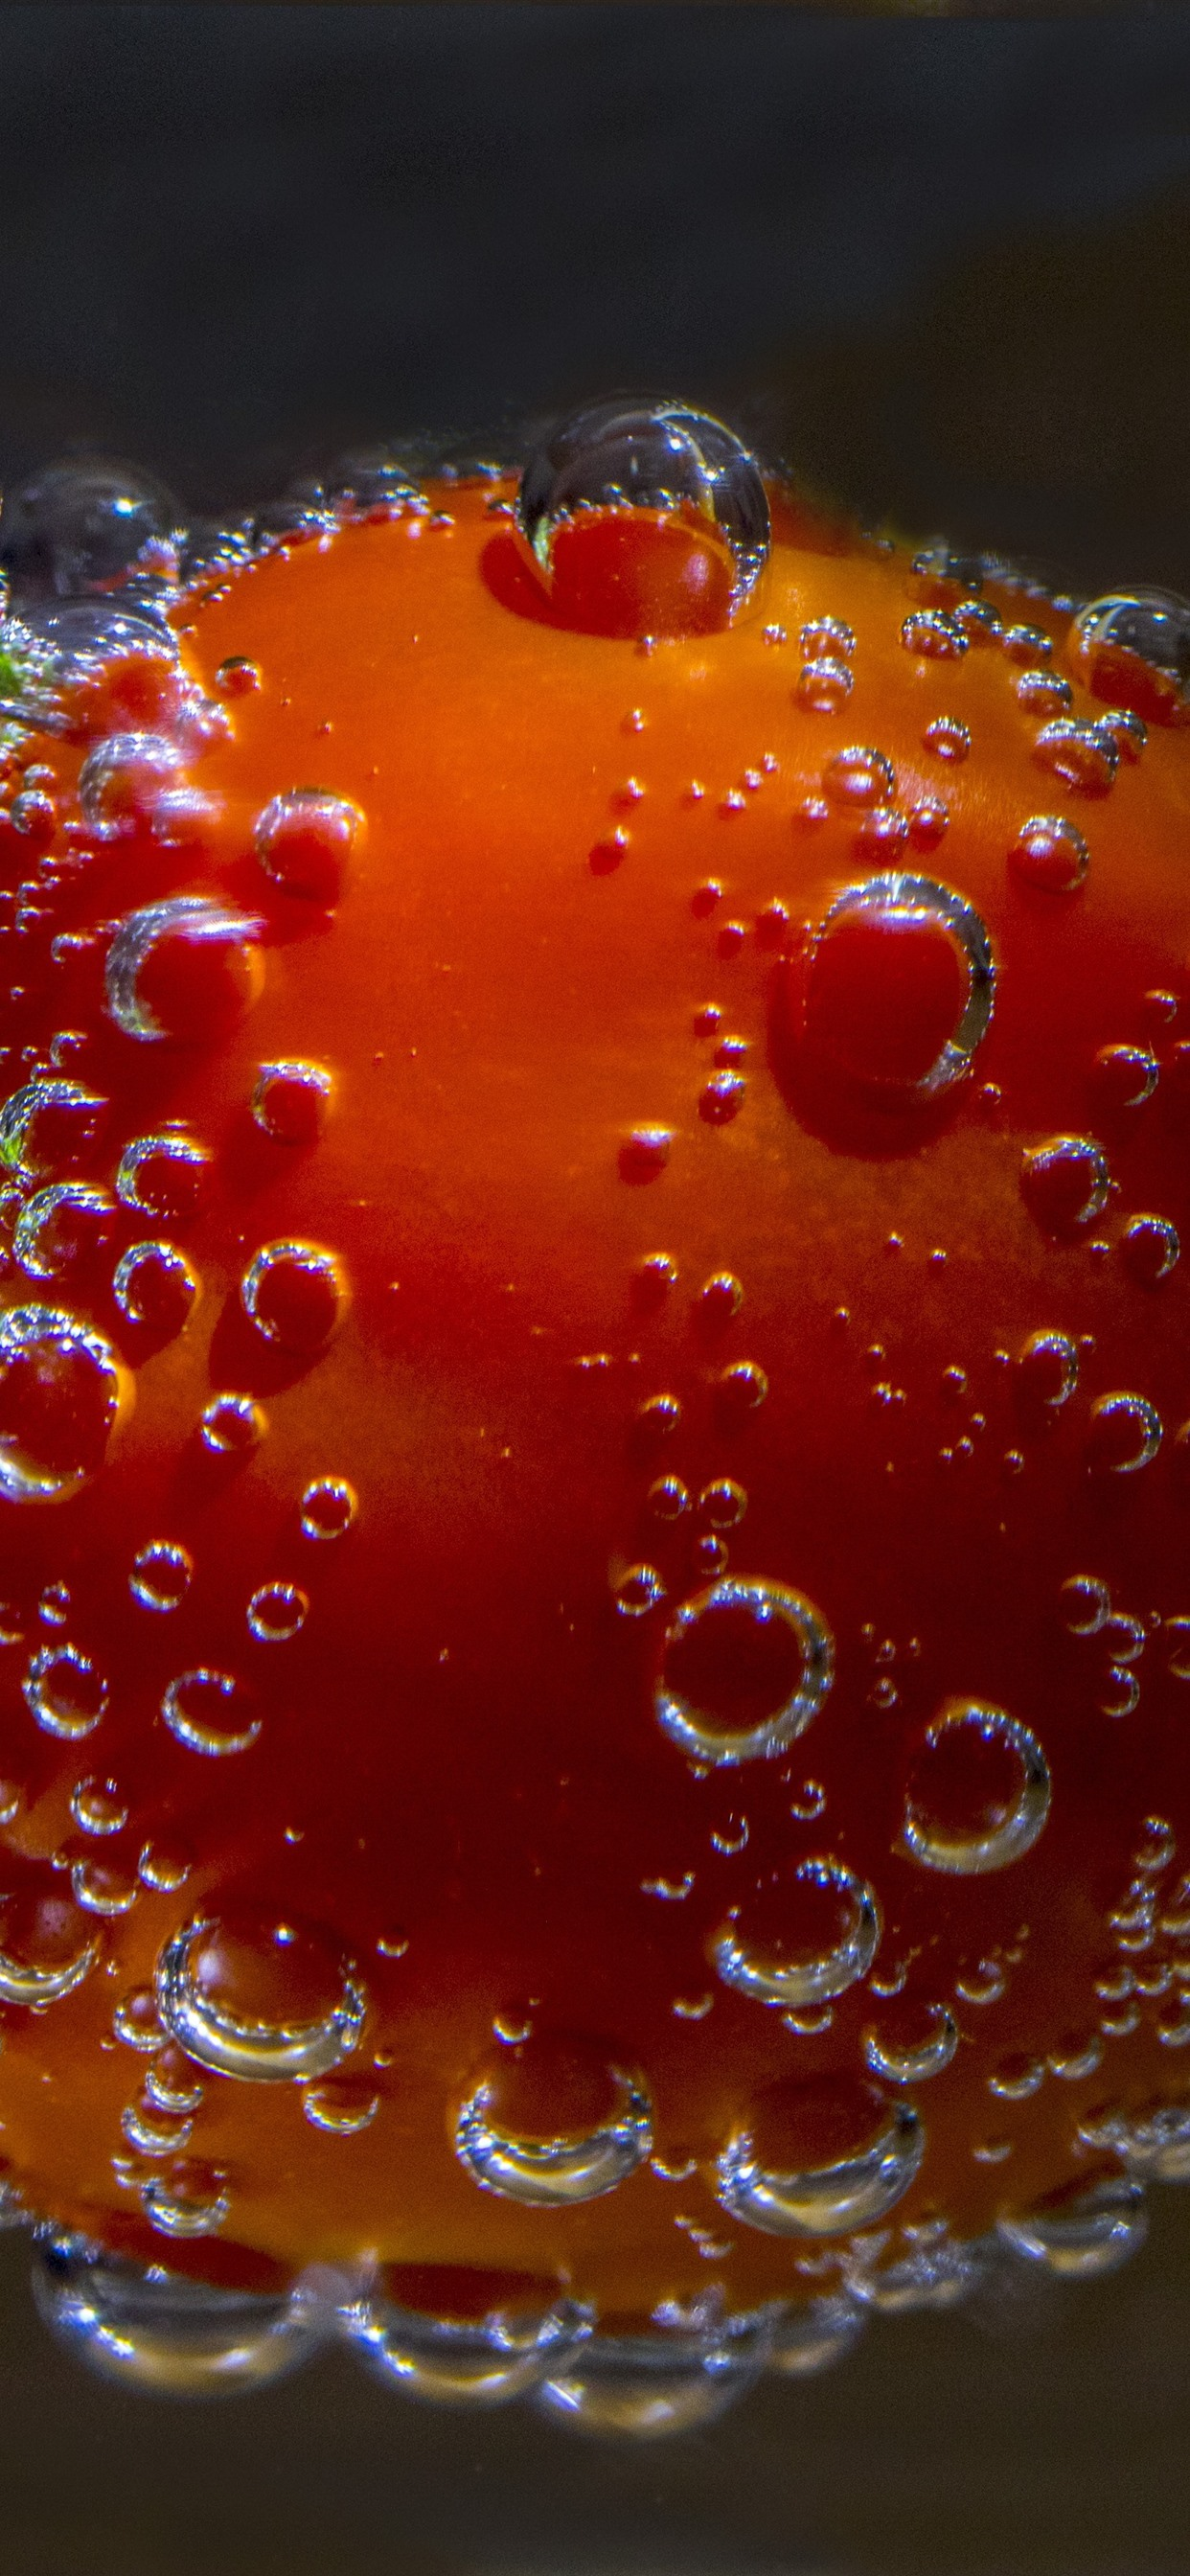 Tomato Water Bubbles 1242x2688 Iphone Xs Max Wallpaper